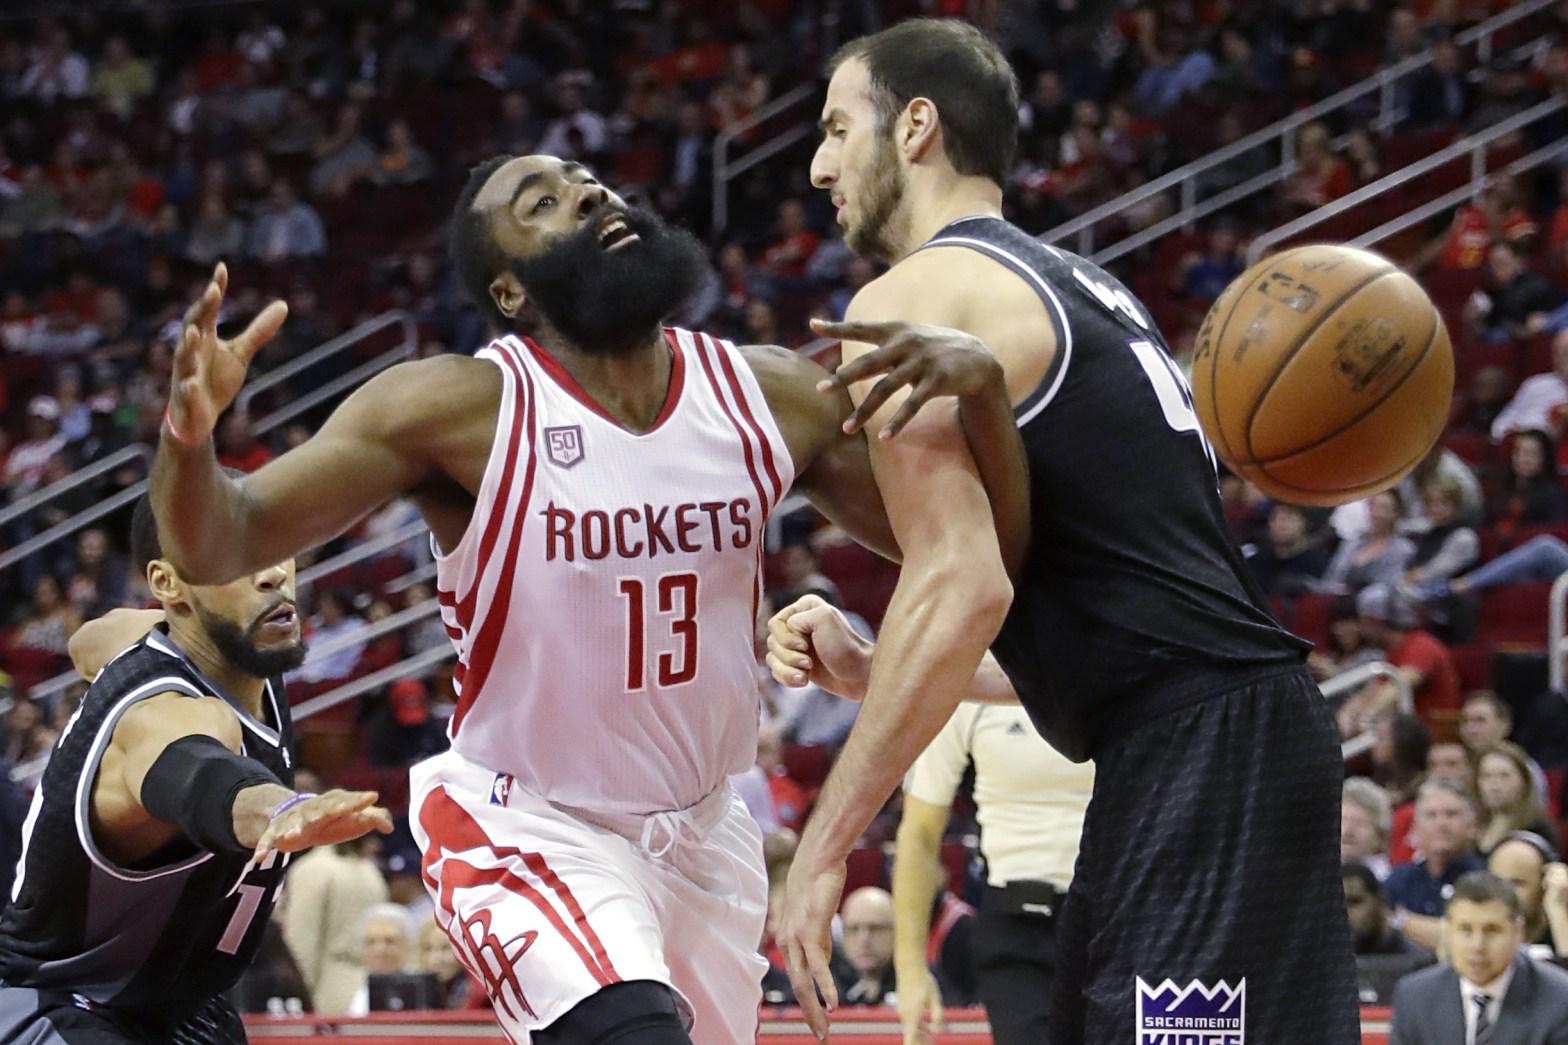 NBA rules and fouls. Credit: Bleacher Report